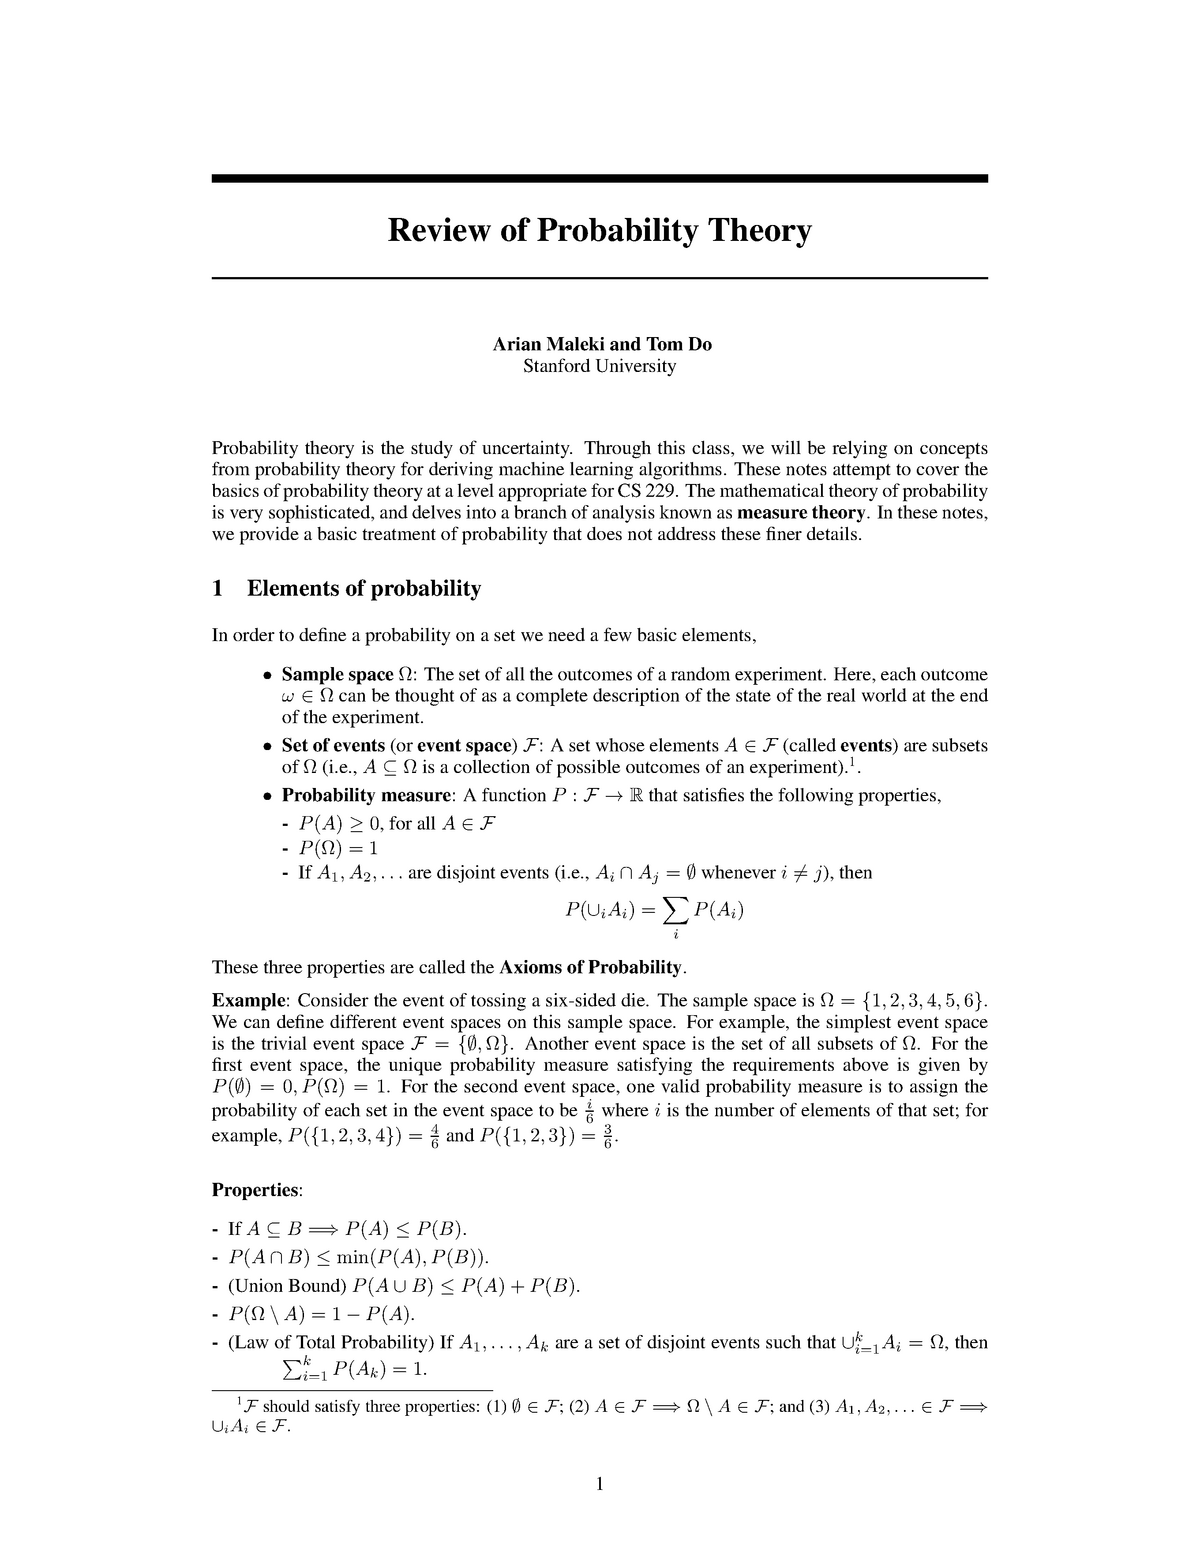 Lecture notes, lectures 10 - 12 - Including problem set - CS 229